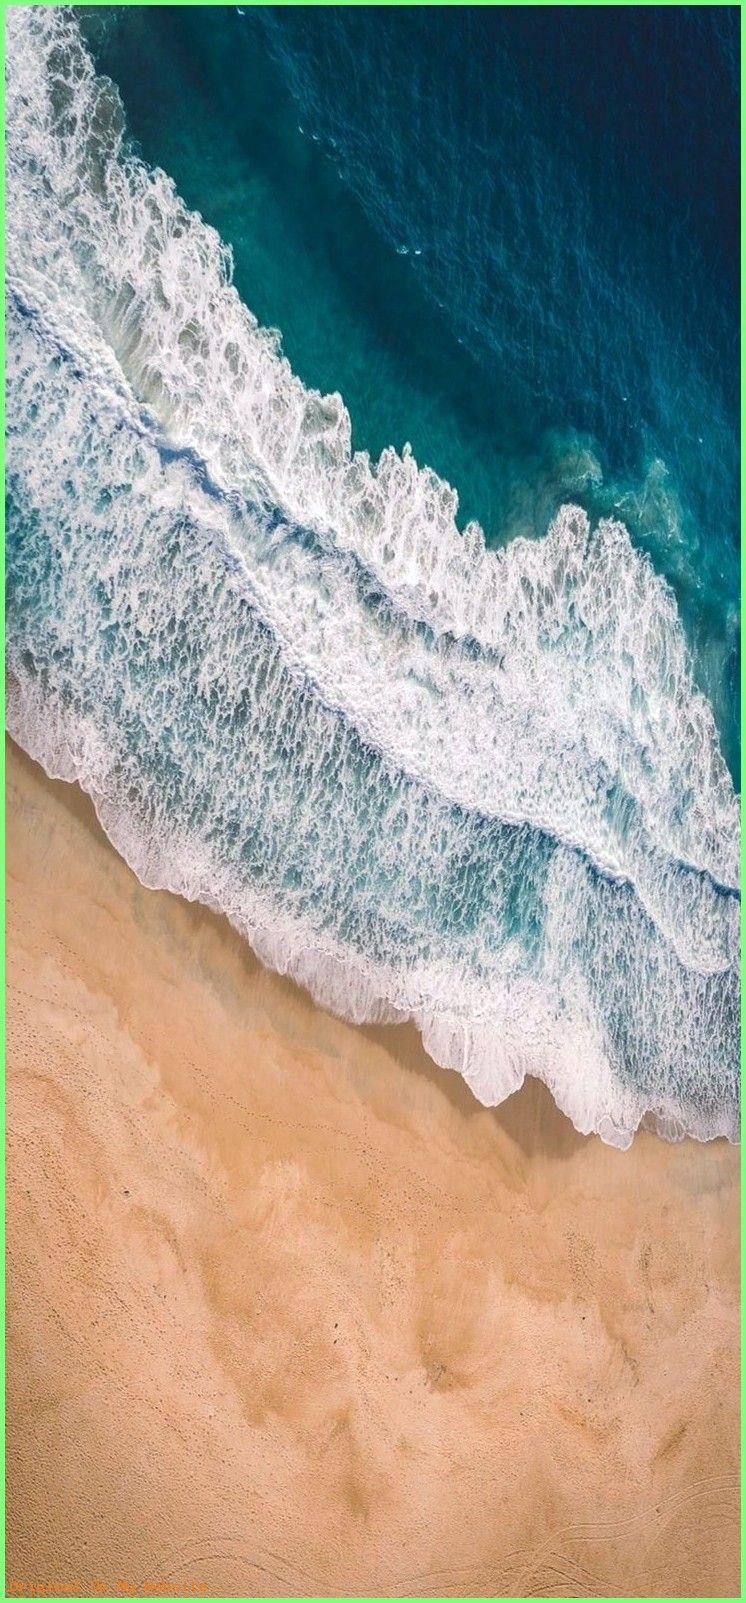 Samsung Galaxy S7 Wallpaper With Sea Samsung Wallpaper Wallpaper Backgrounds Galaxy Wallpaper